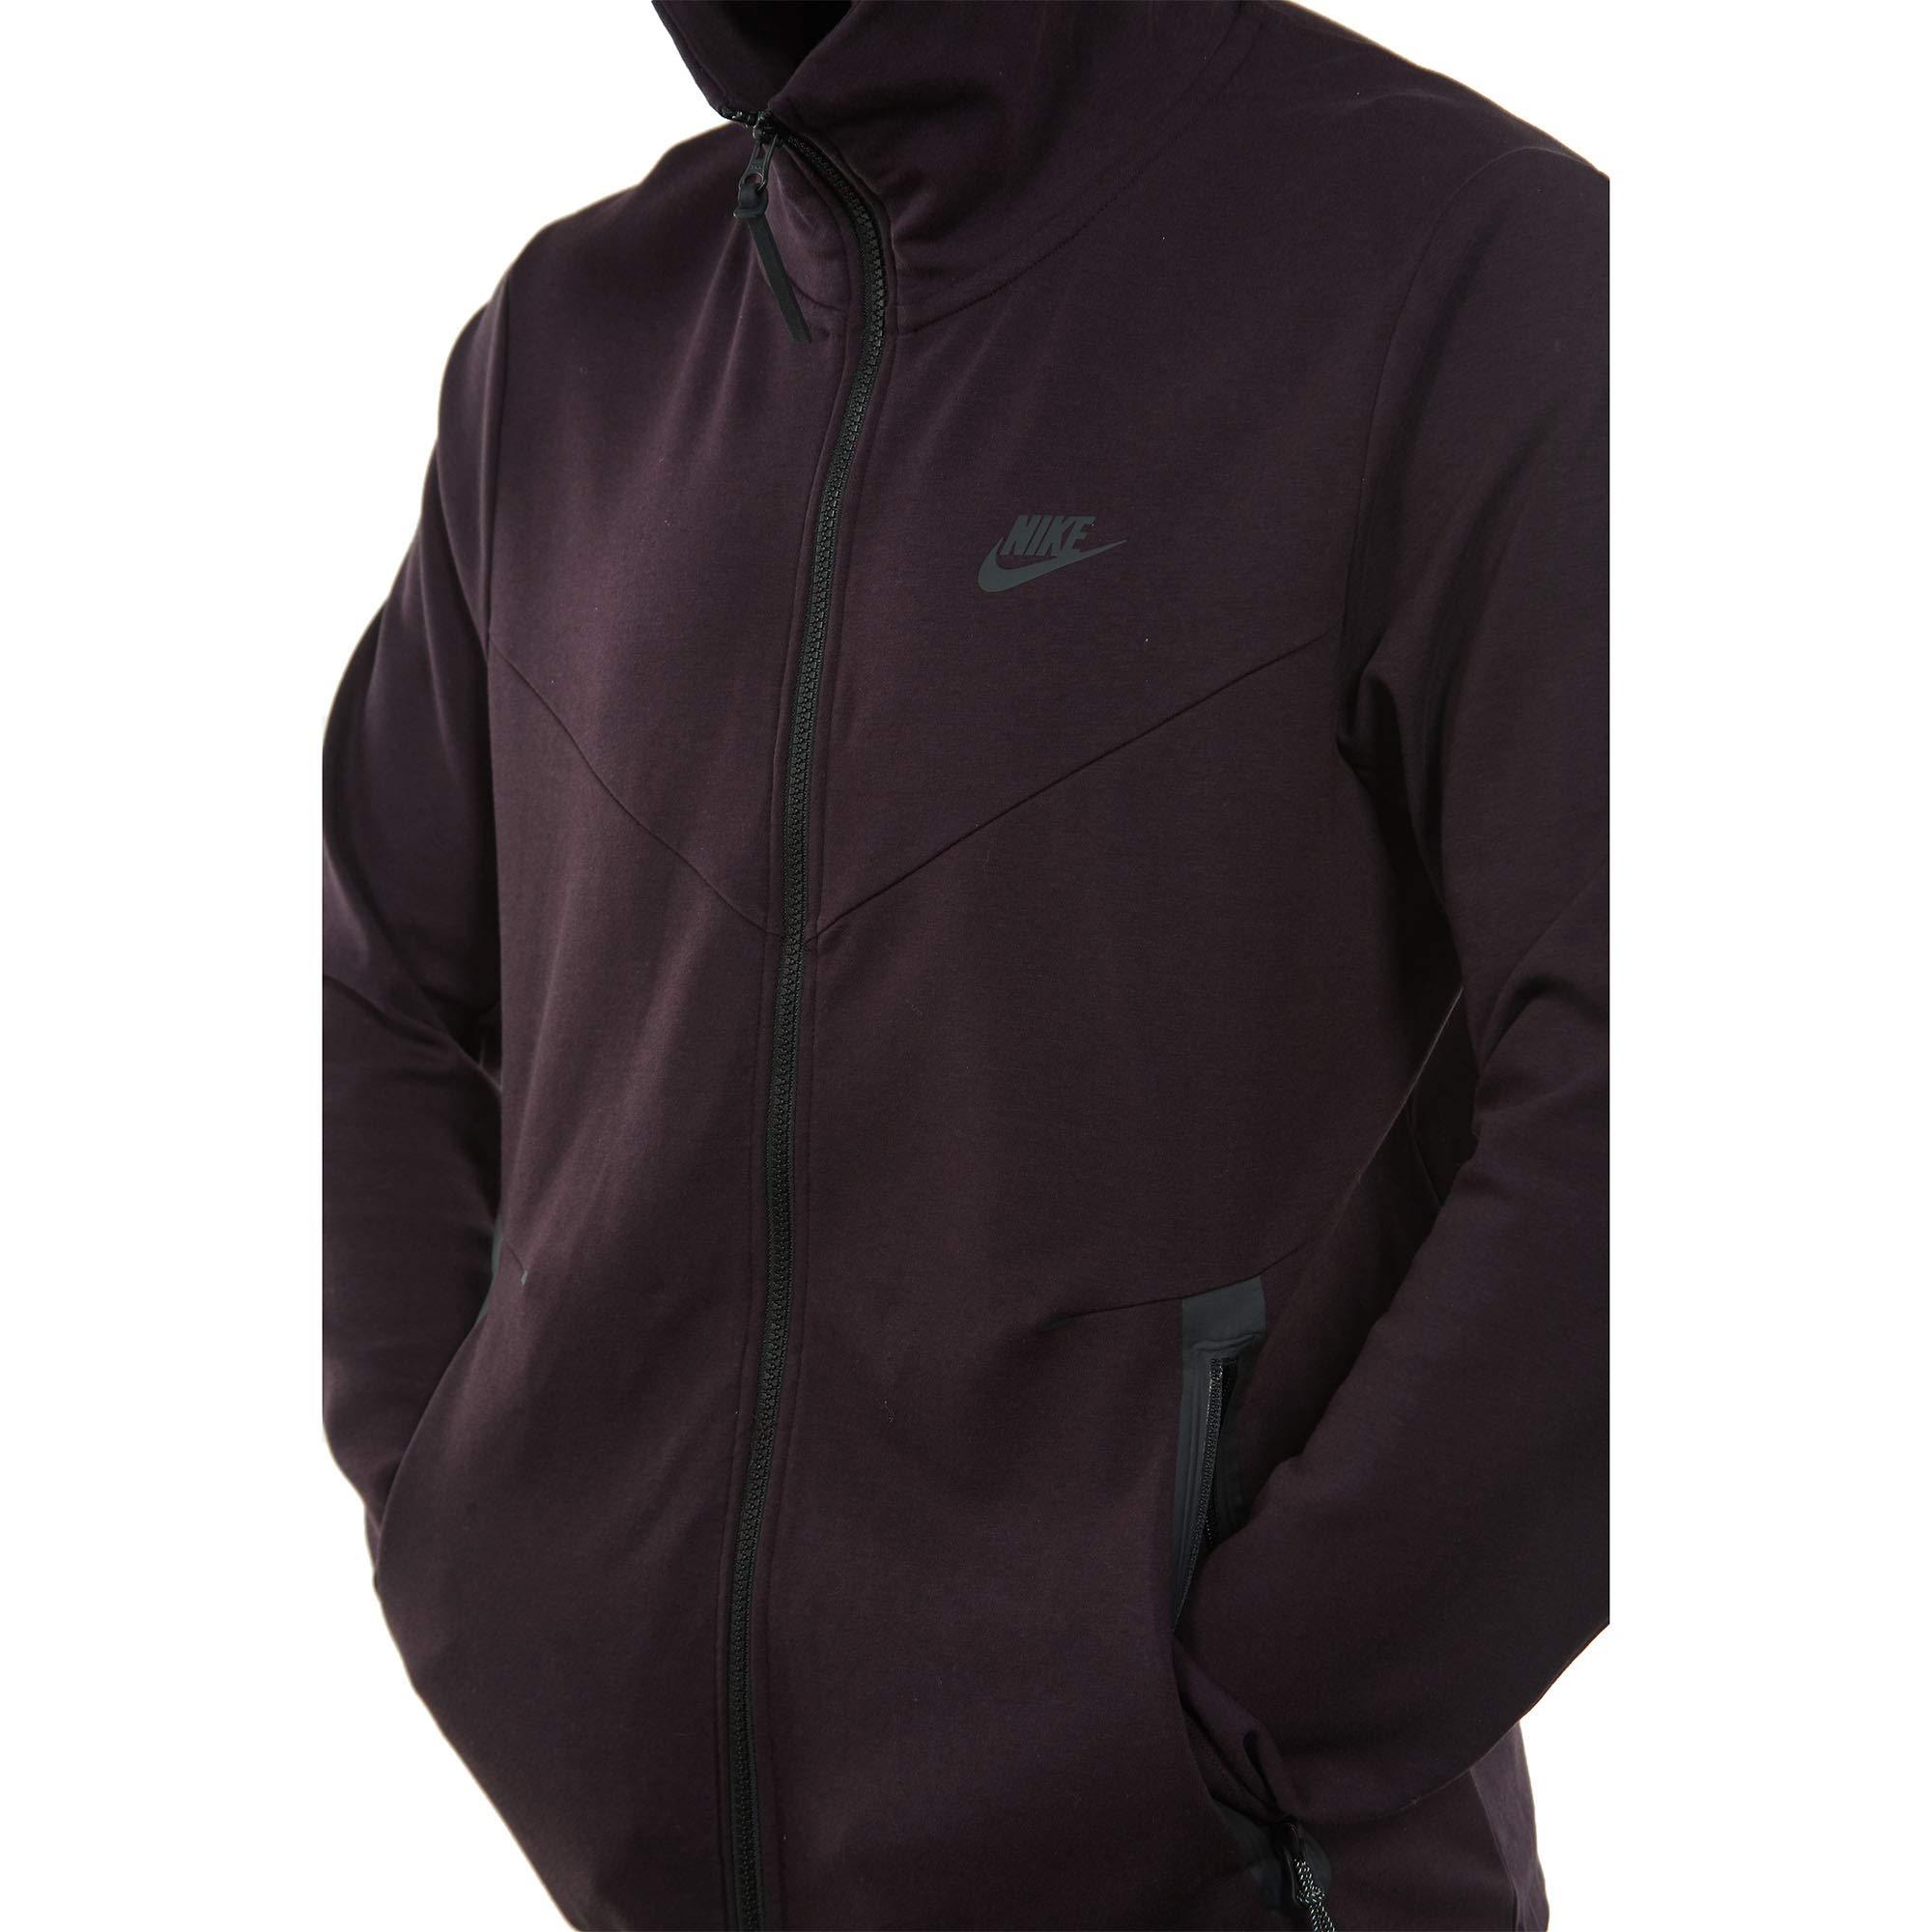 Nike Mens Tech Fleece Pack Full Zip Training Hoodie Burgundy Ash/Black AA3784-659 Size Small by Nike (Image #5)